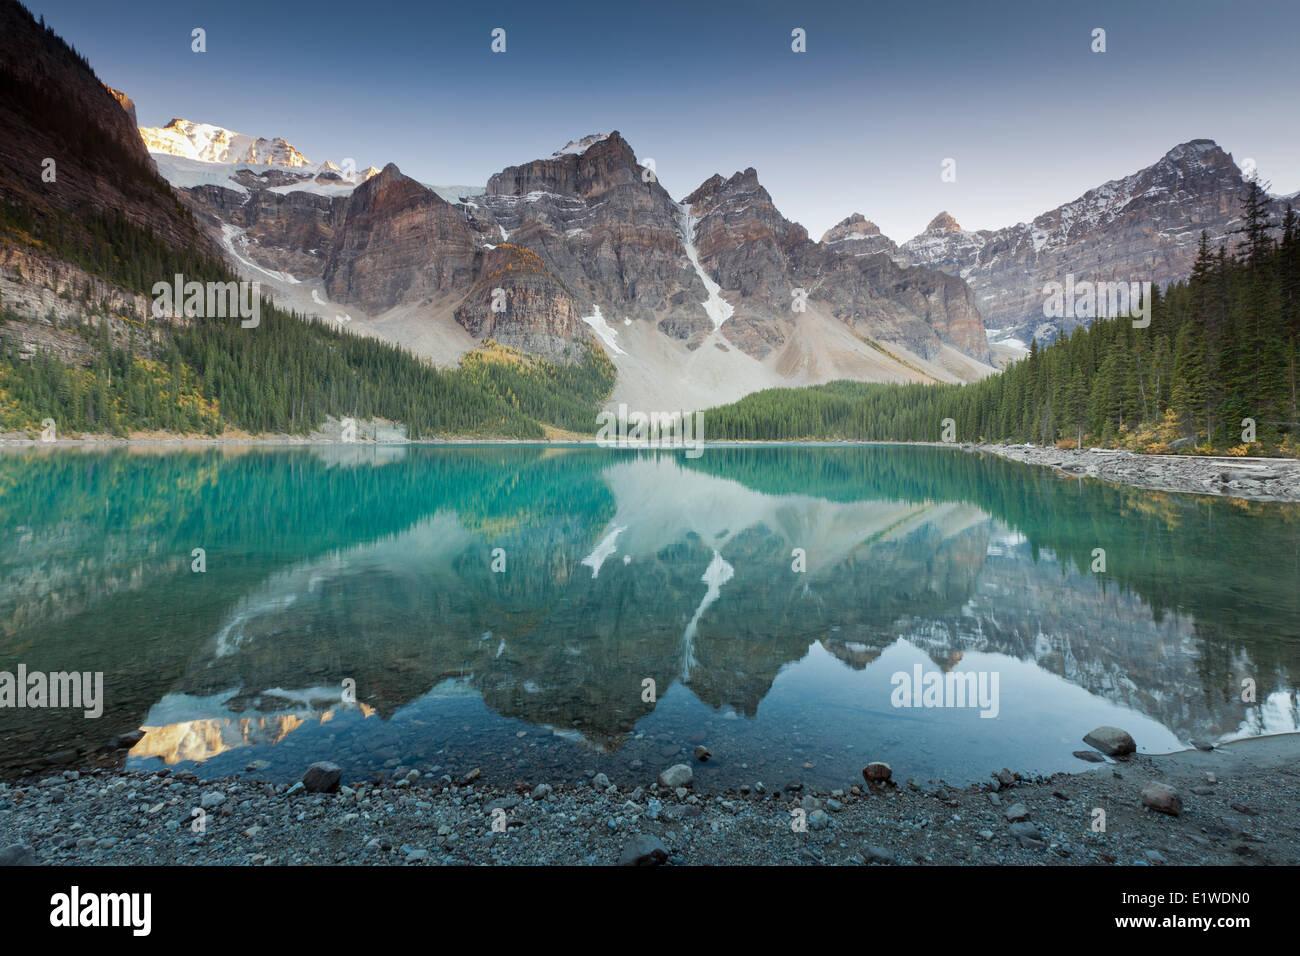 Moraine Lake im Tal trail the Ten Peaks des Seeufers in Banff Nationalpark Alberta Kanada - türkise Farbe oder blau Stockfoto